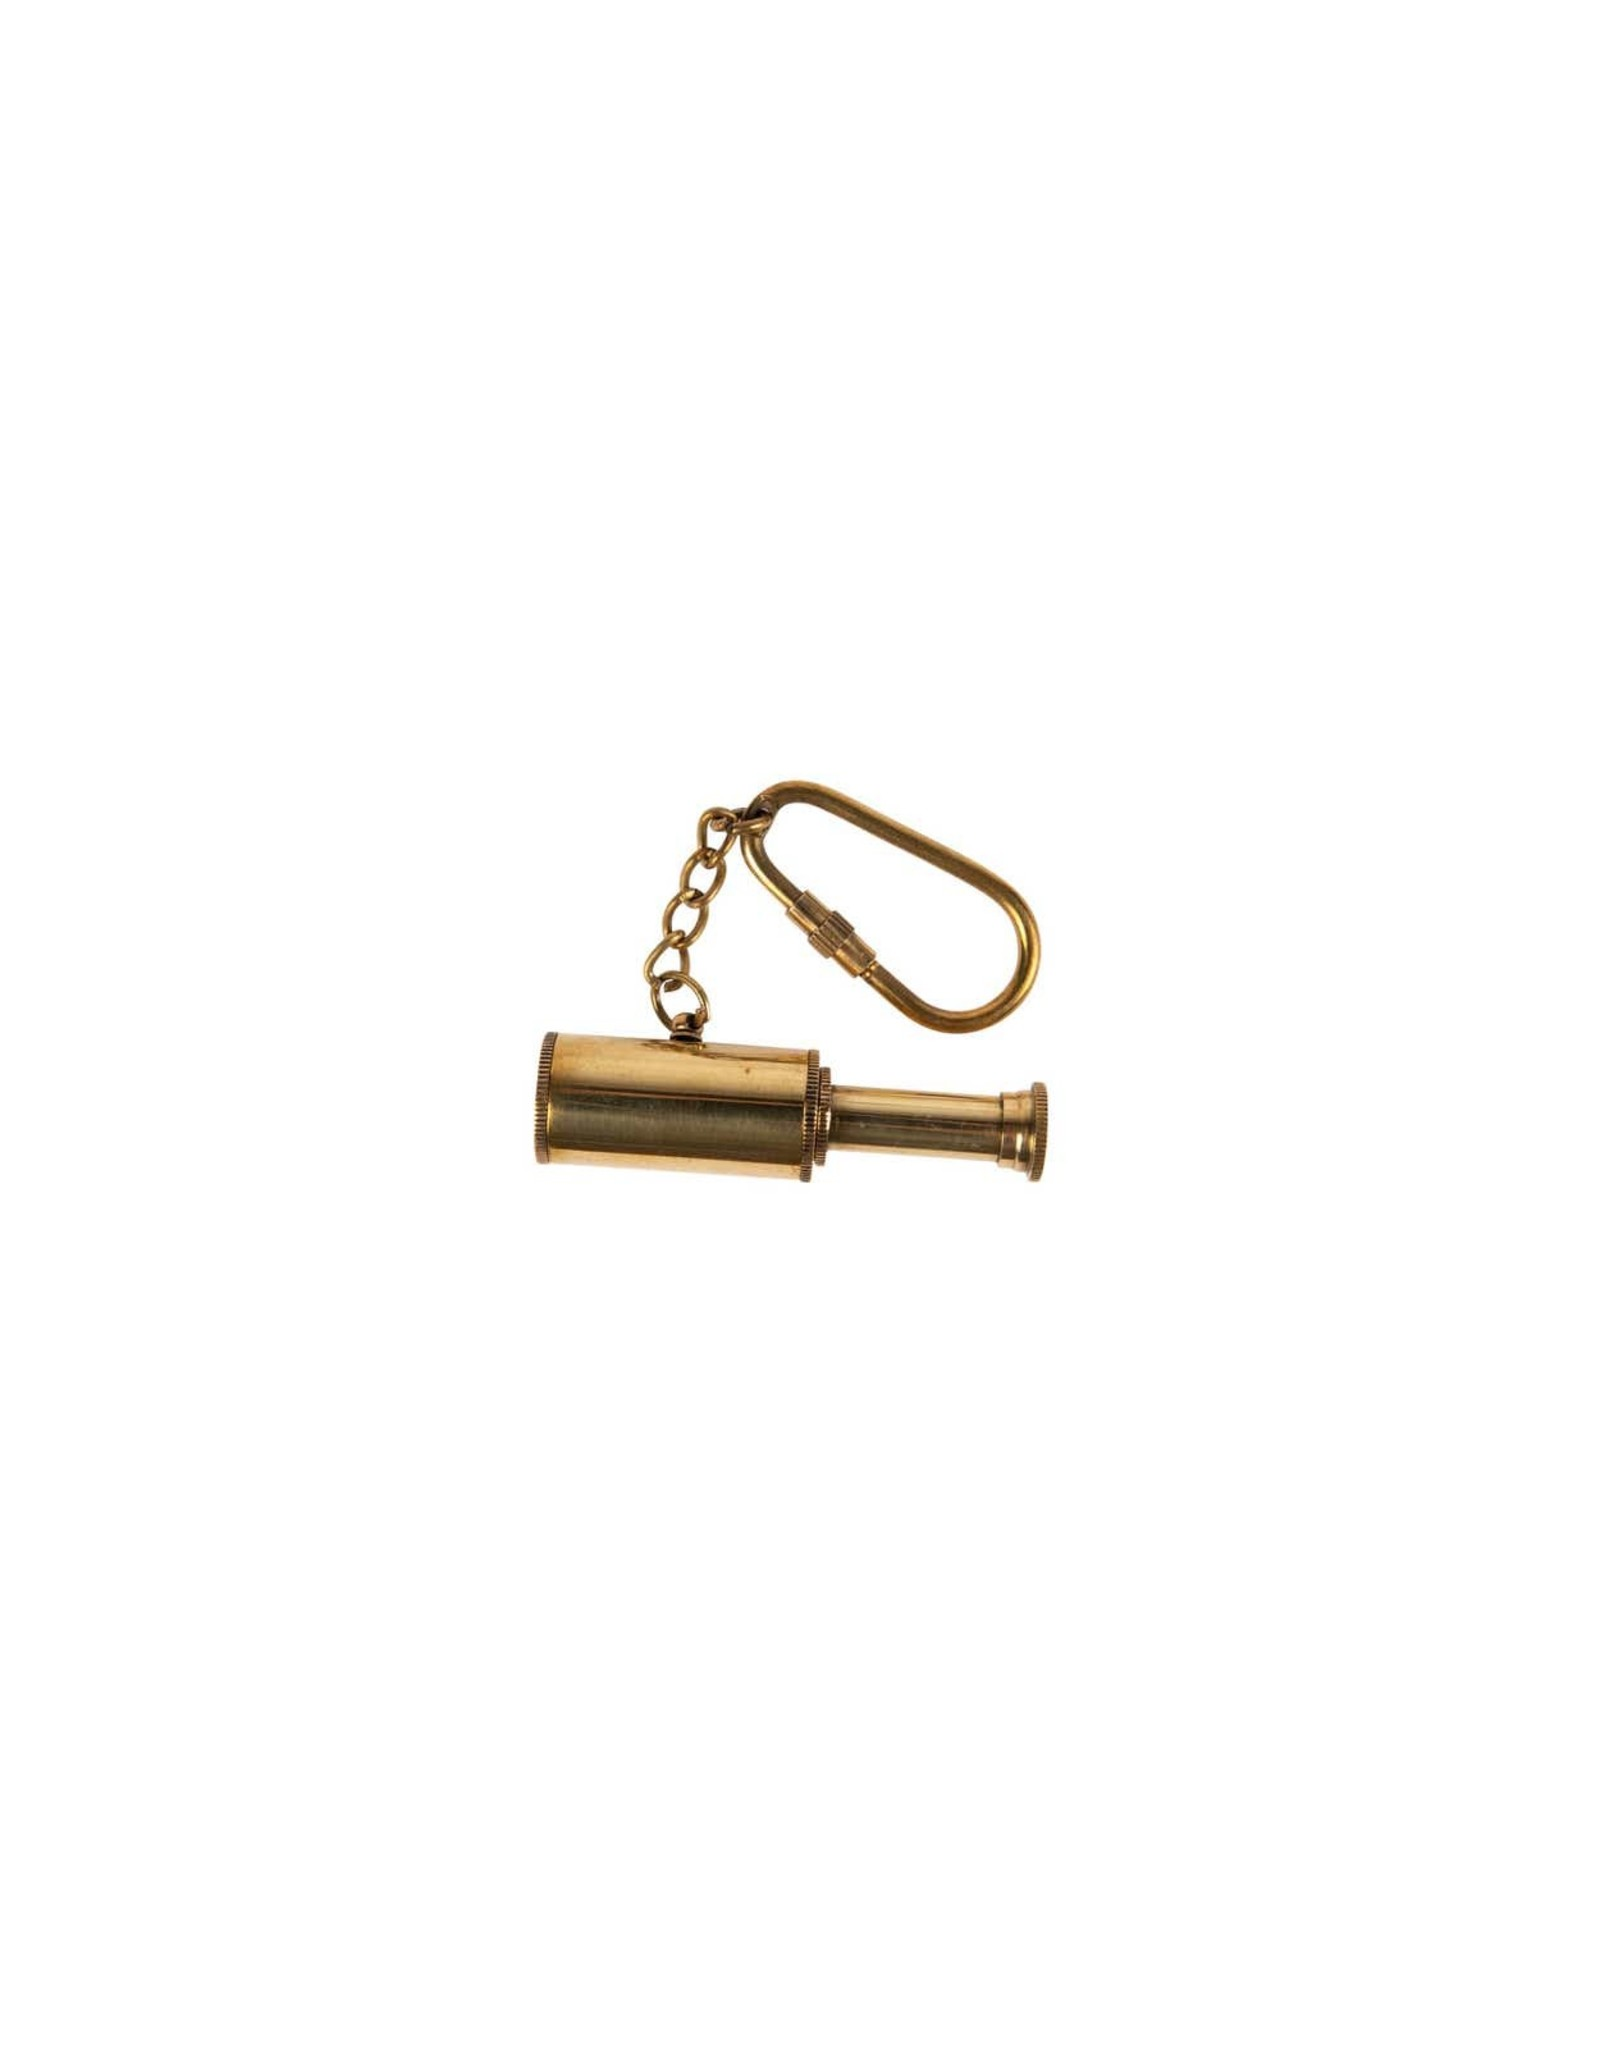 Mini Telescope Key Chain, India